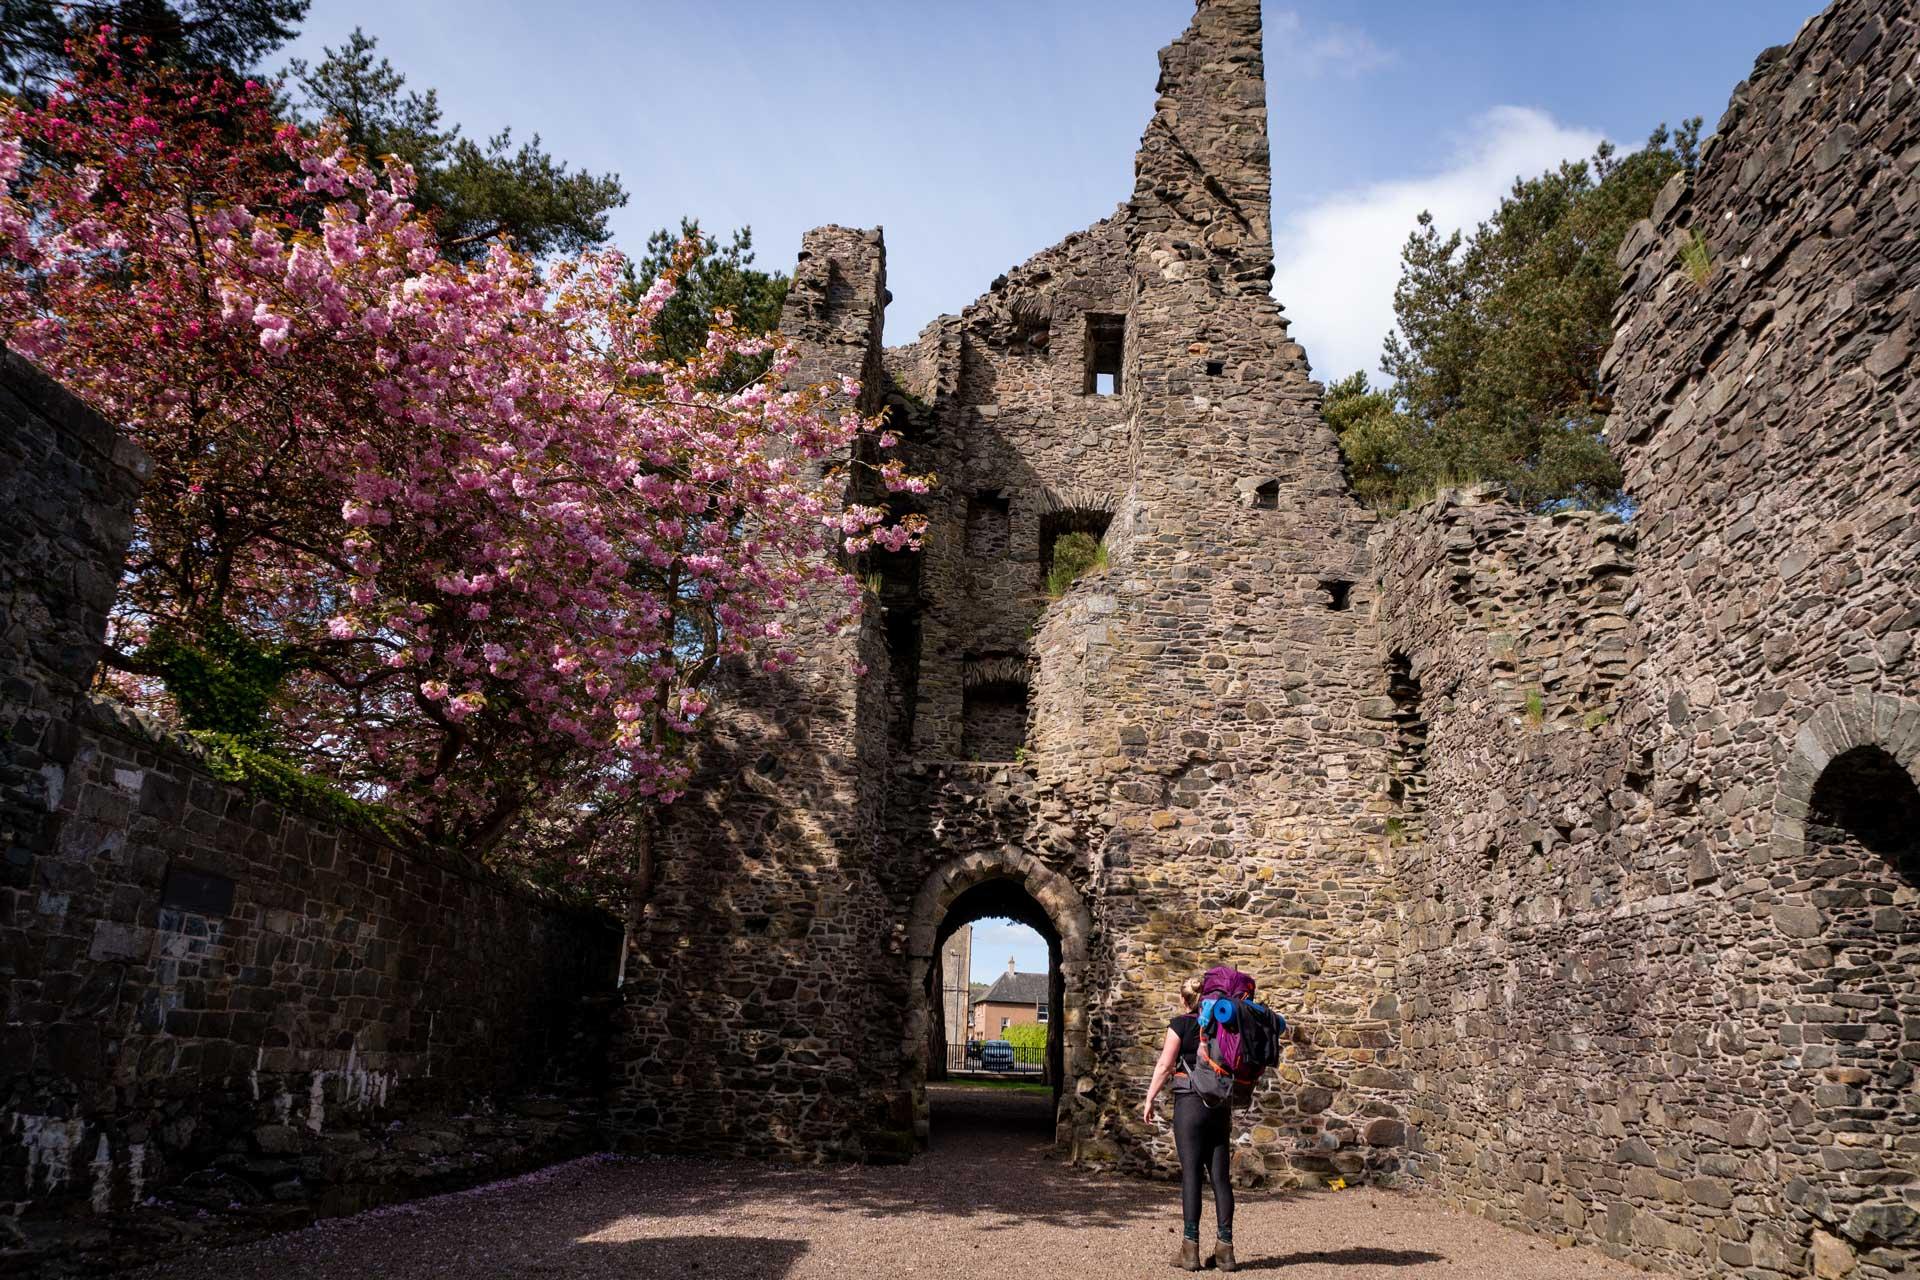 8 insights I learned while hiking Scotland solo